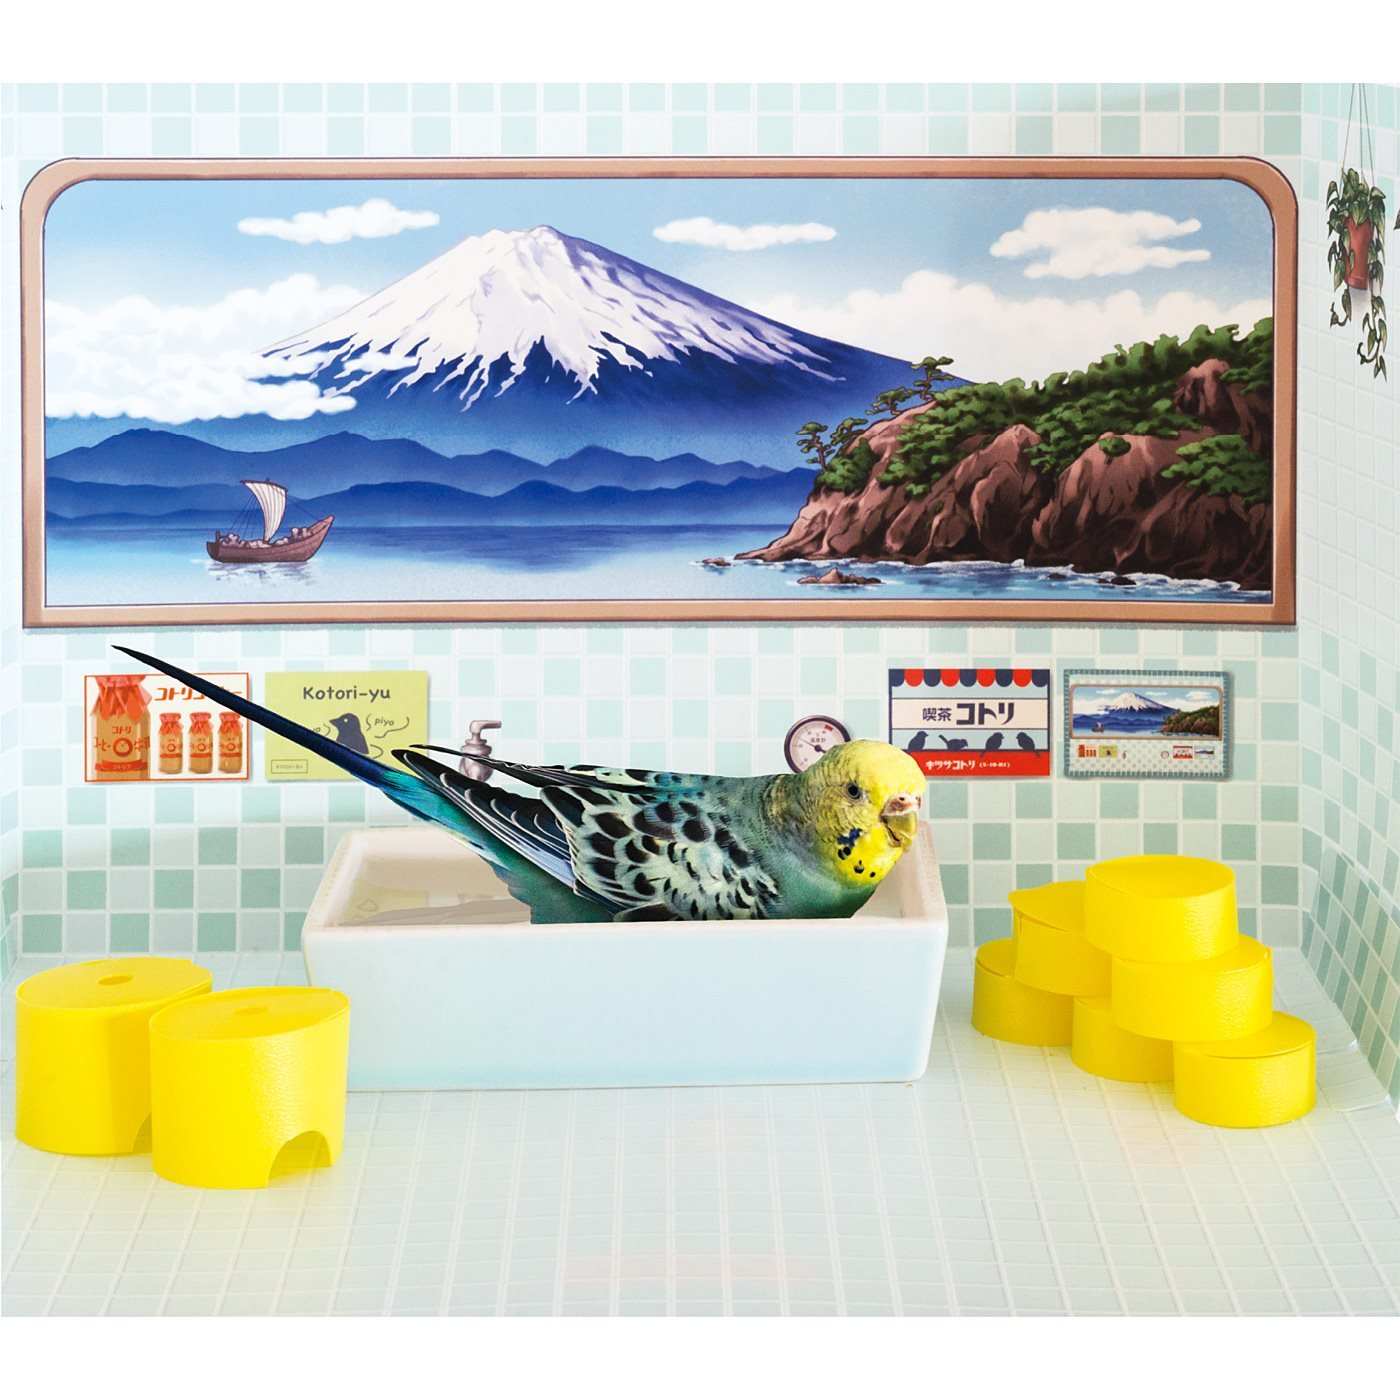 YOU+MORE!×小鳥部 レトロなお風呂で水浴びできちゃう バード銭湯